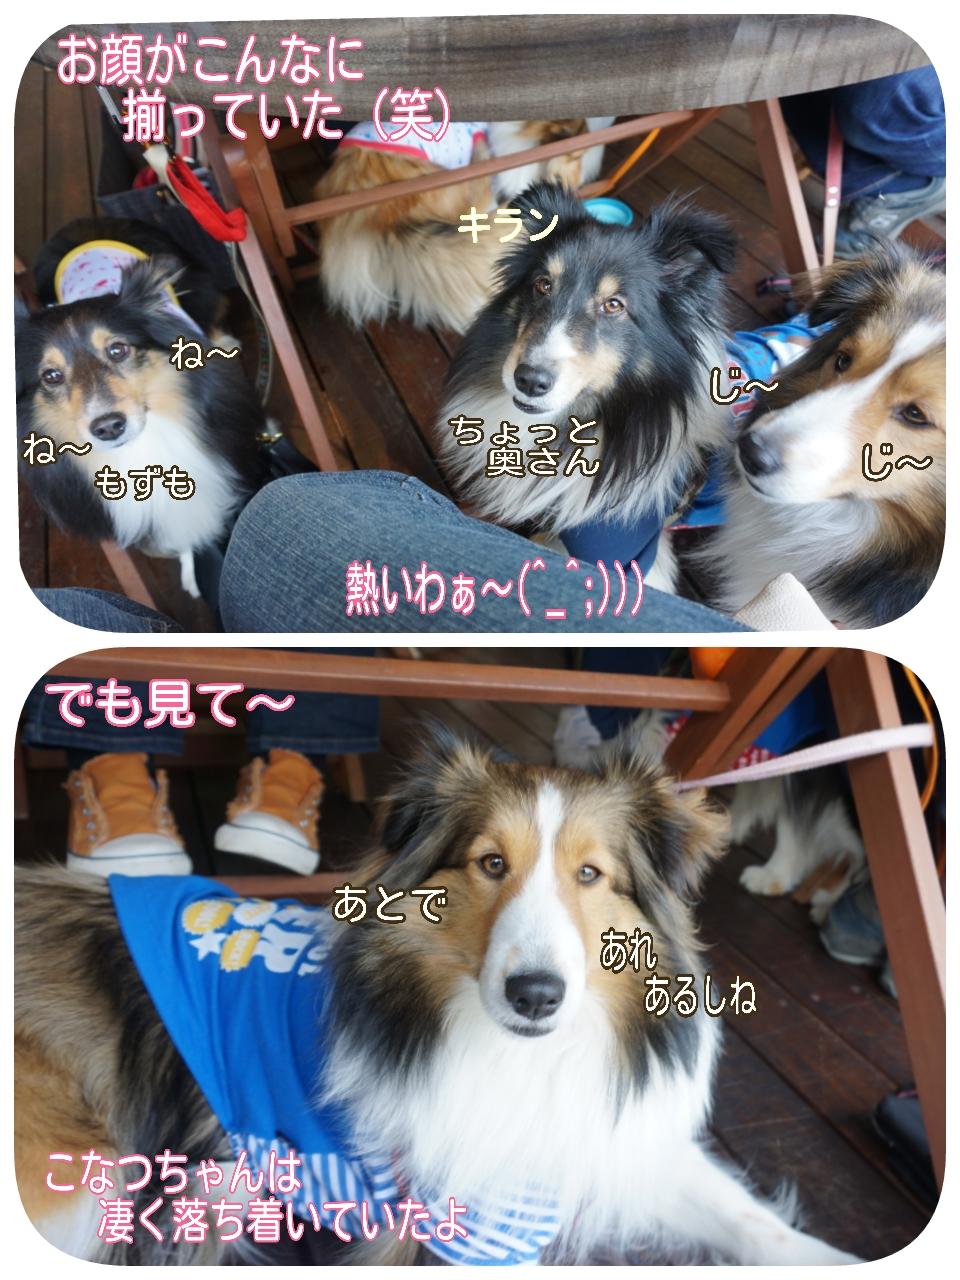 2015-04-13-14-27-56_deco.jpg